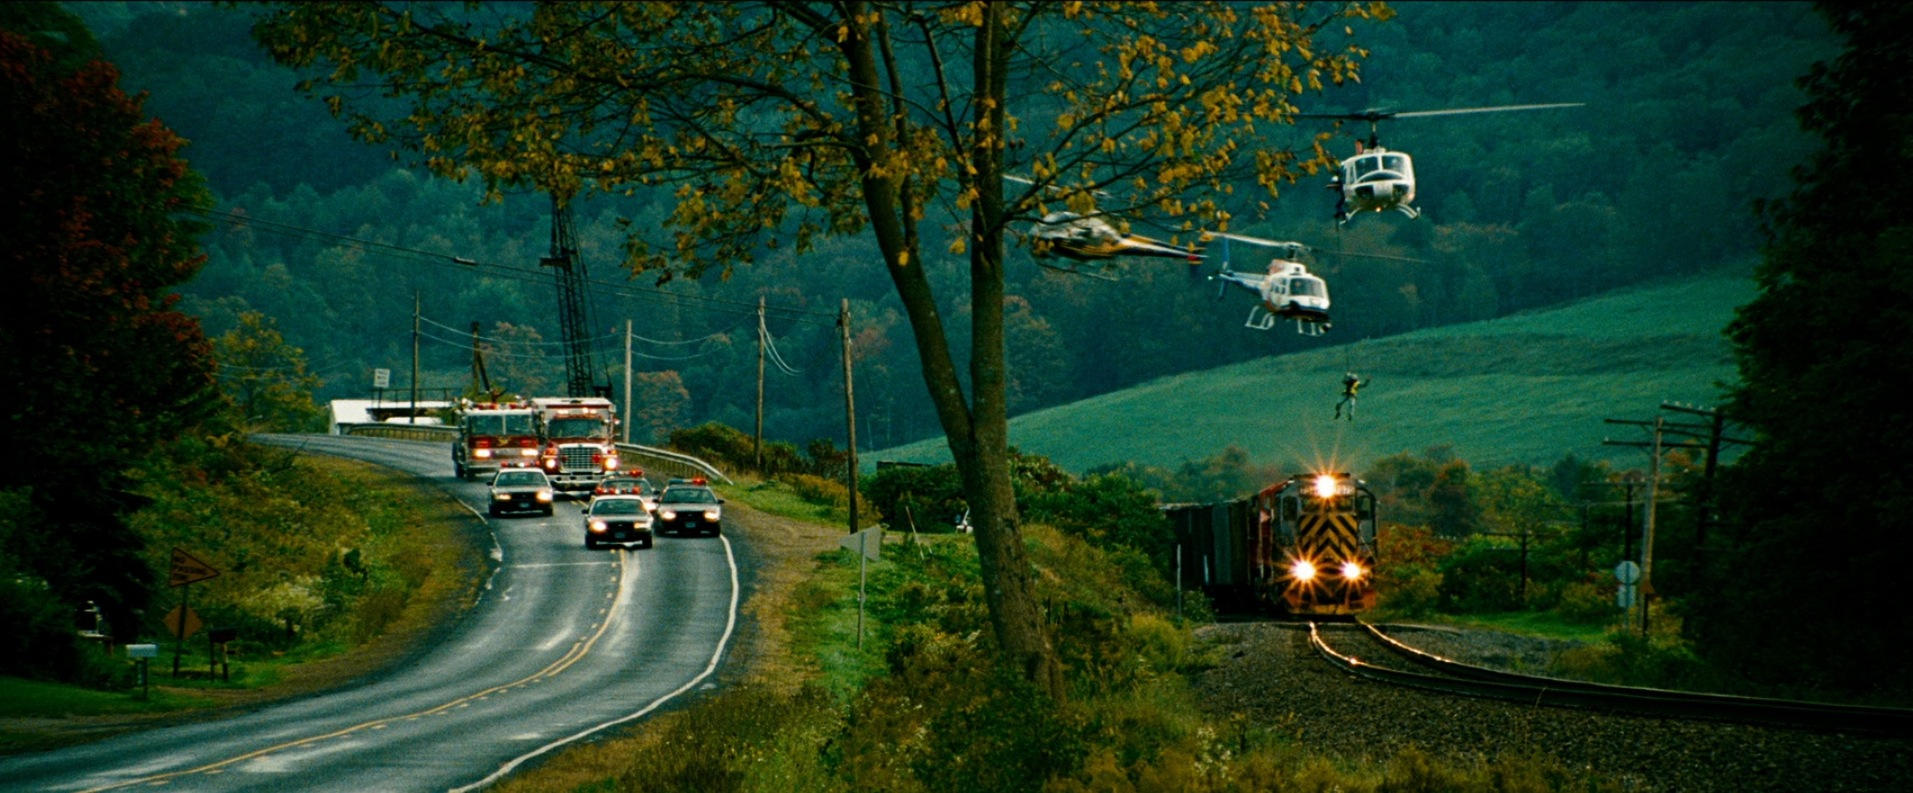 Image from  Unstoppable  (filmed in Pittsburgh, Pennsylvania) via  Google.